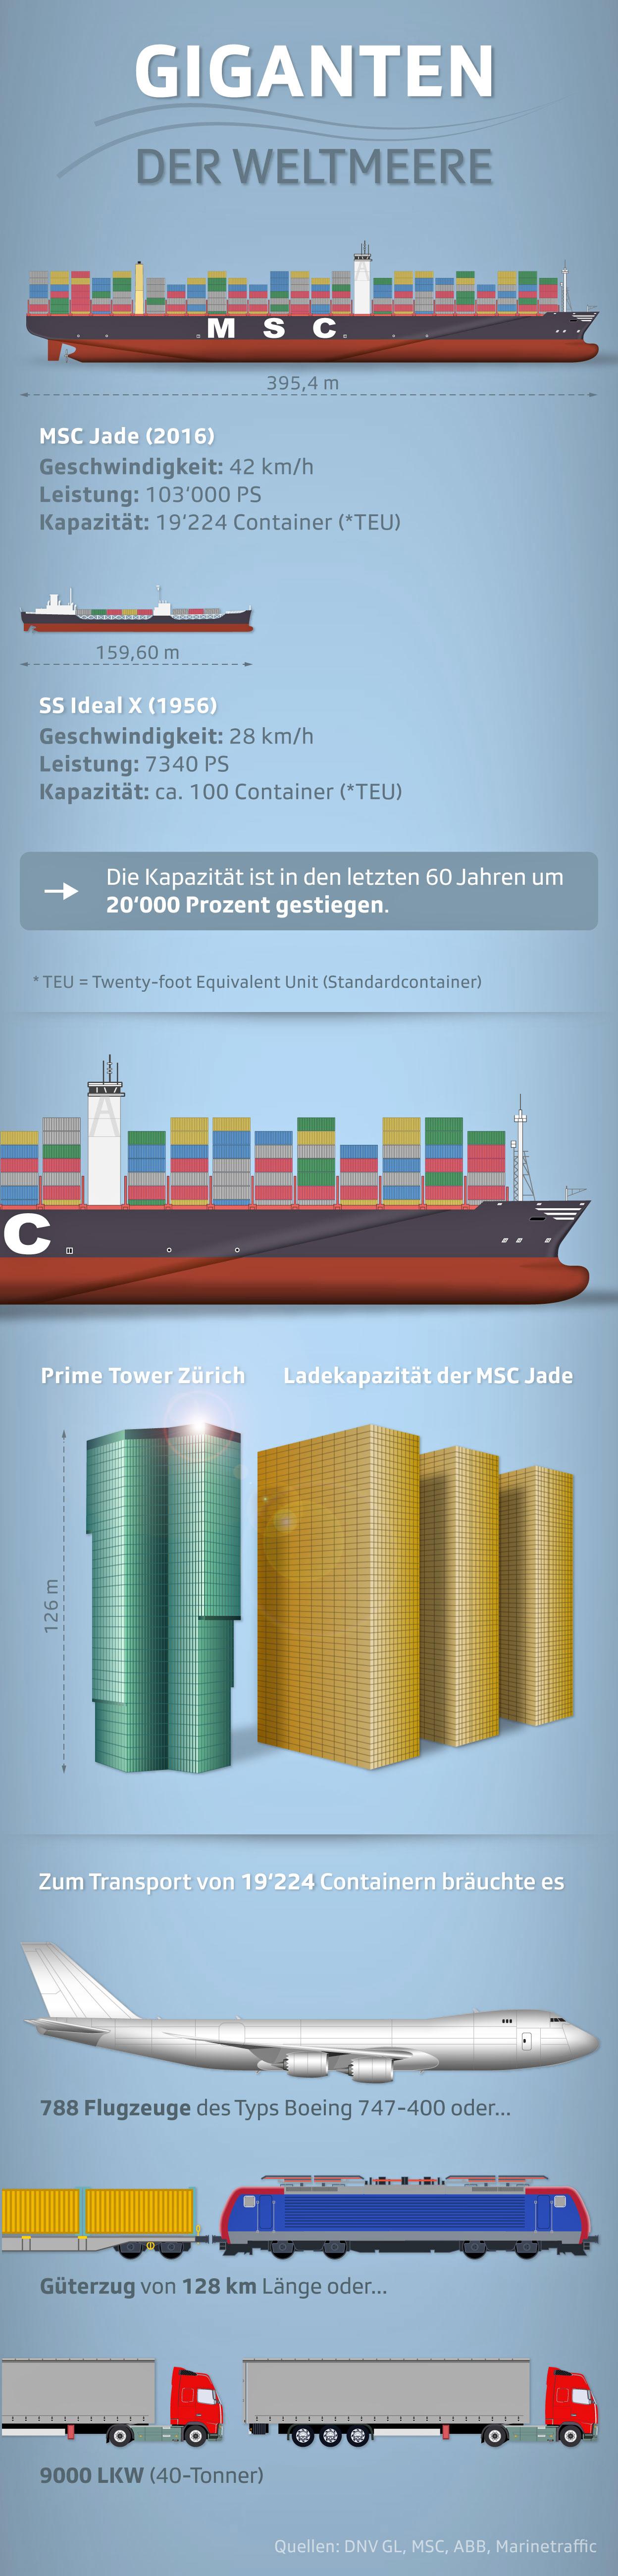 Grafik Frachtschiffe